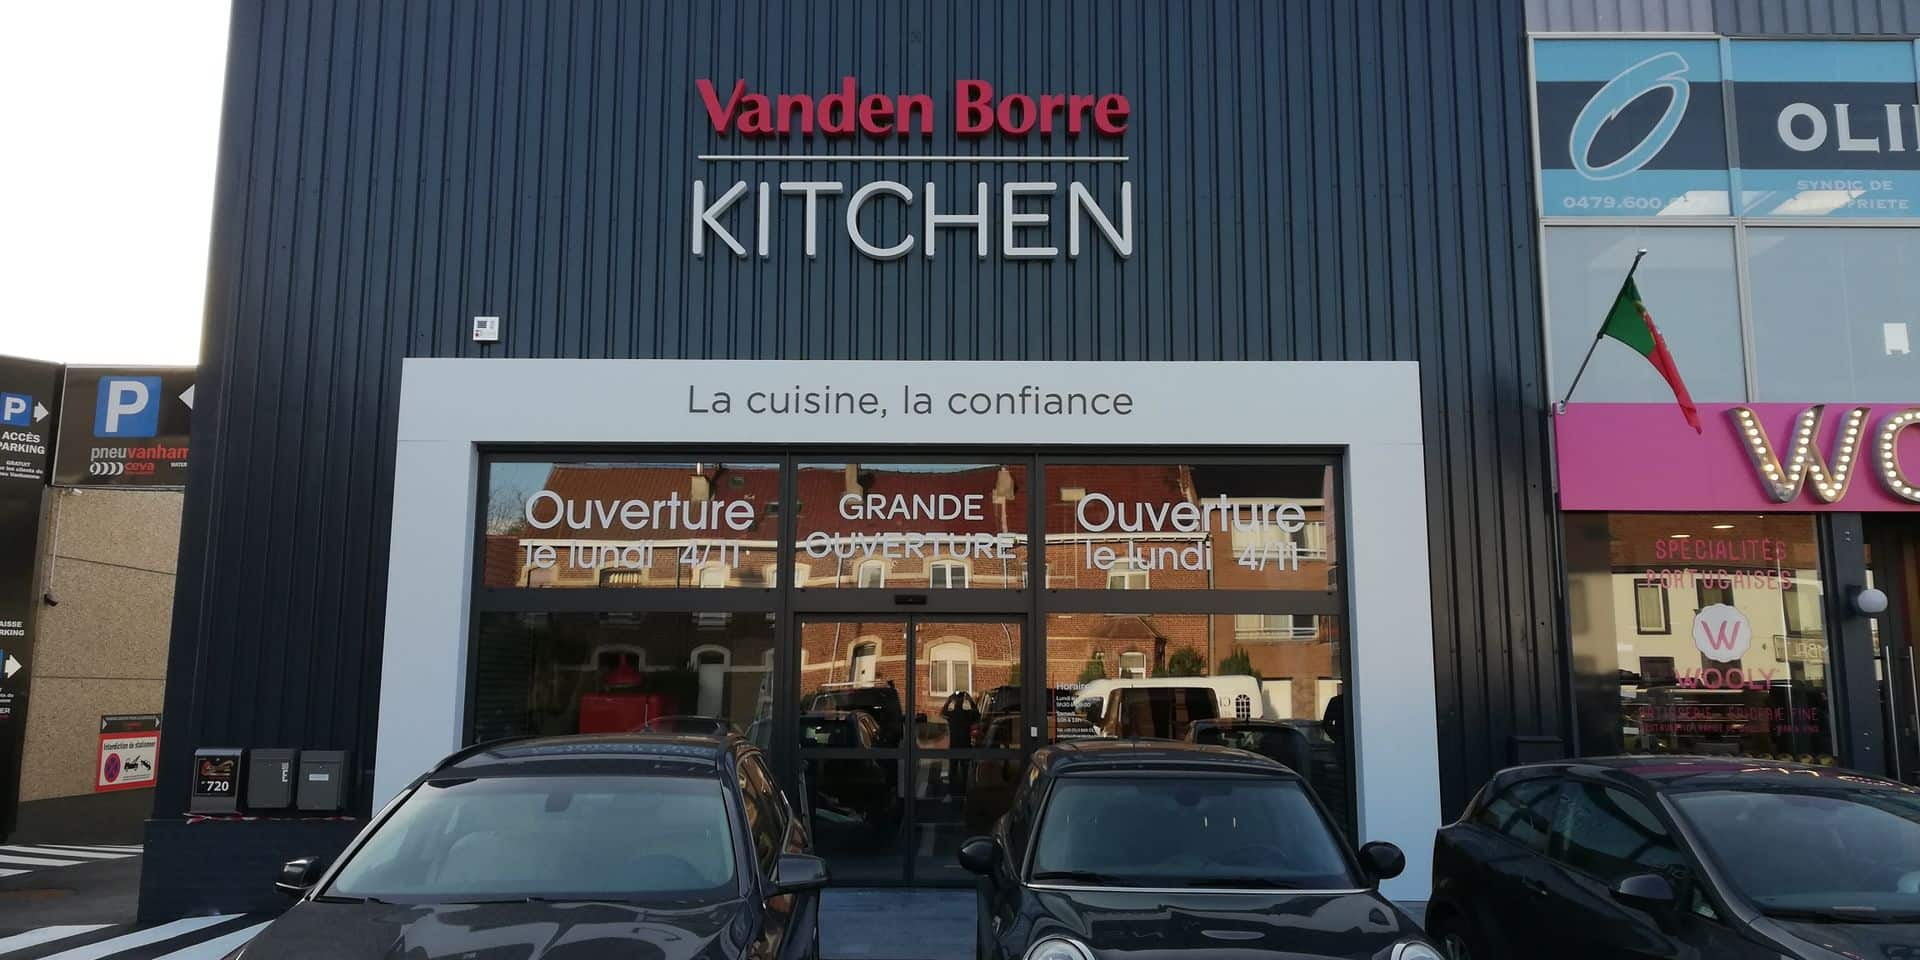 Vanden Borre Kitchen s'installe à Waterloo